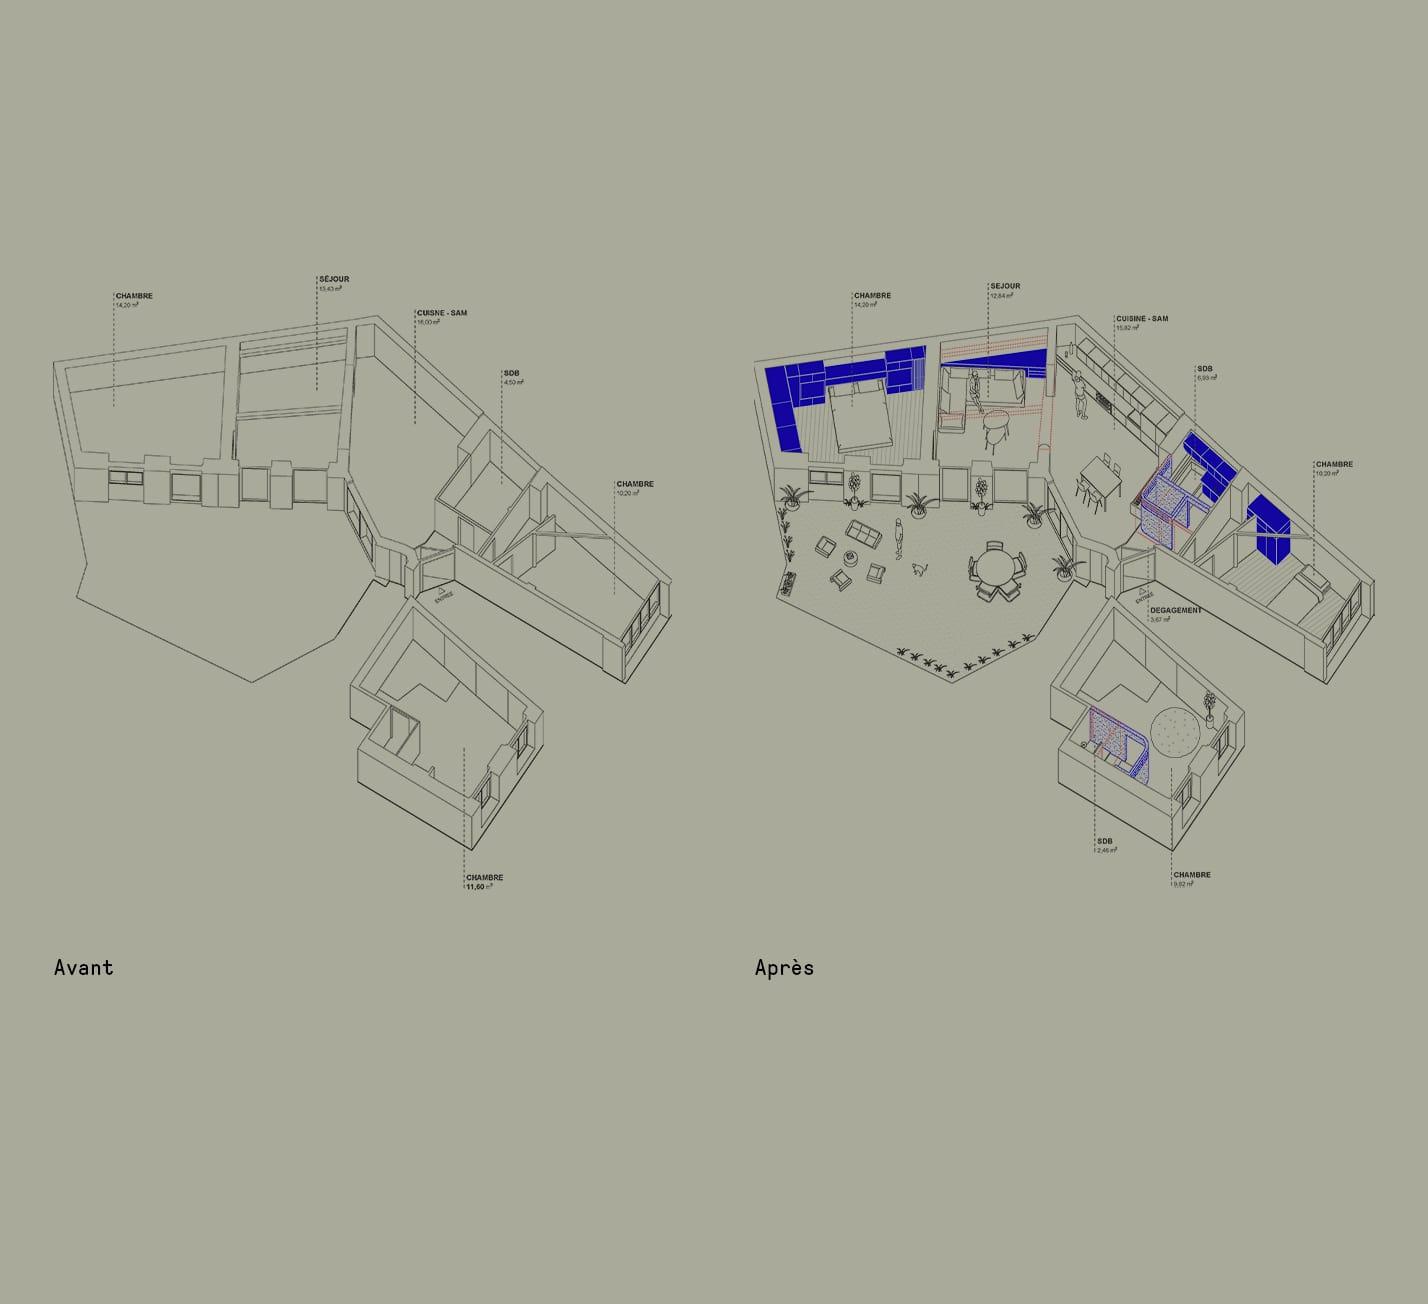 Appartement-Gobelins-Psd-dessins-03-min